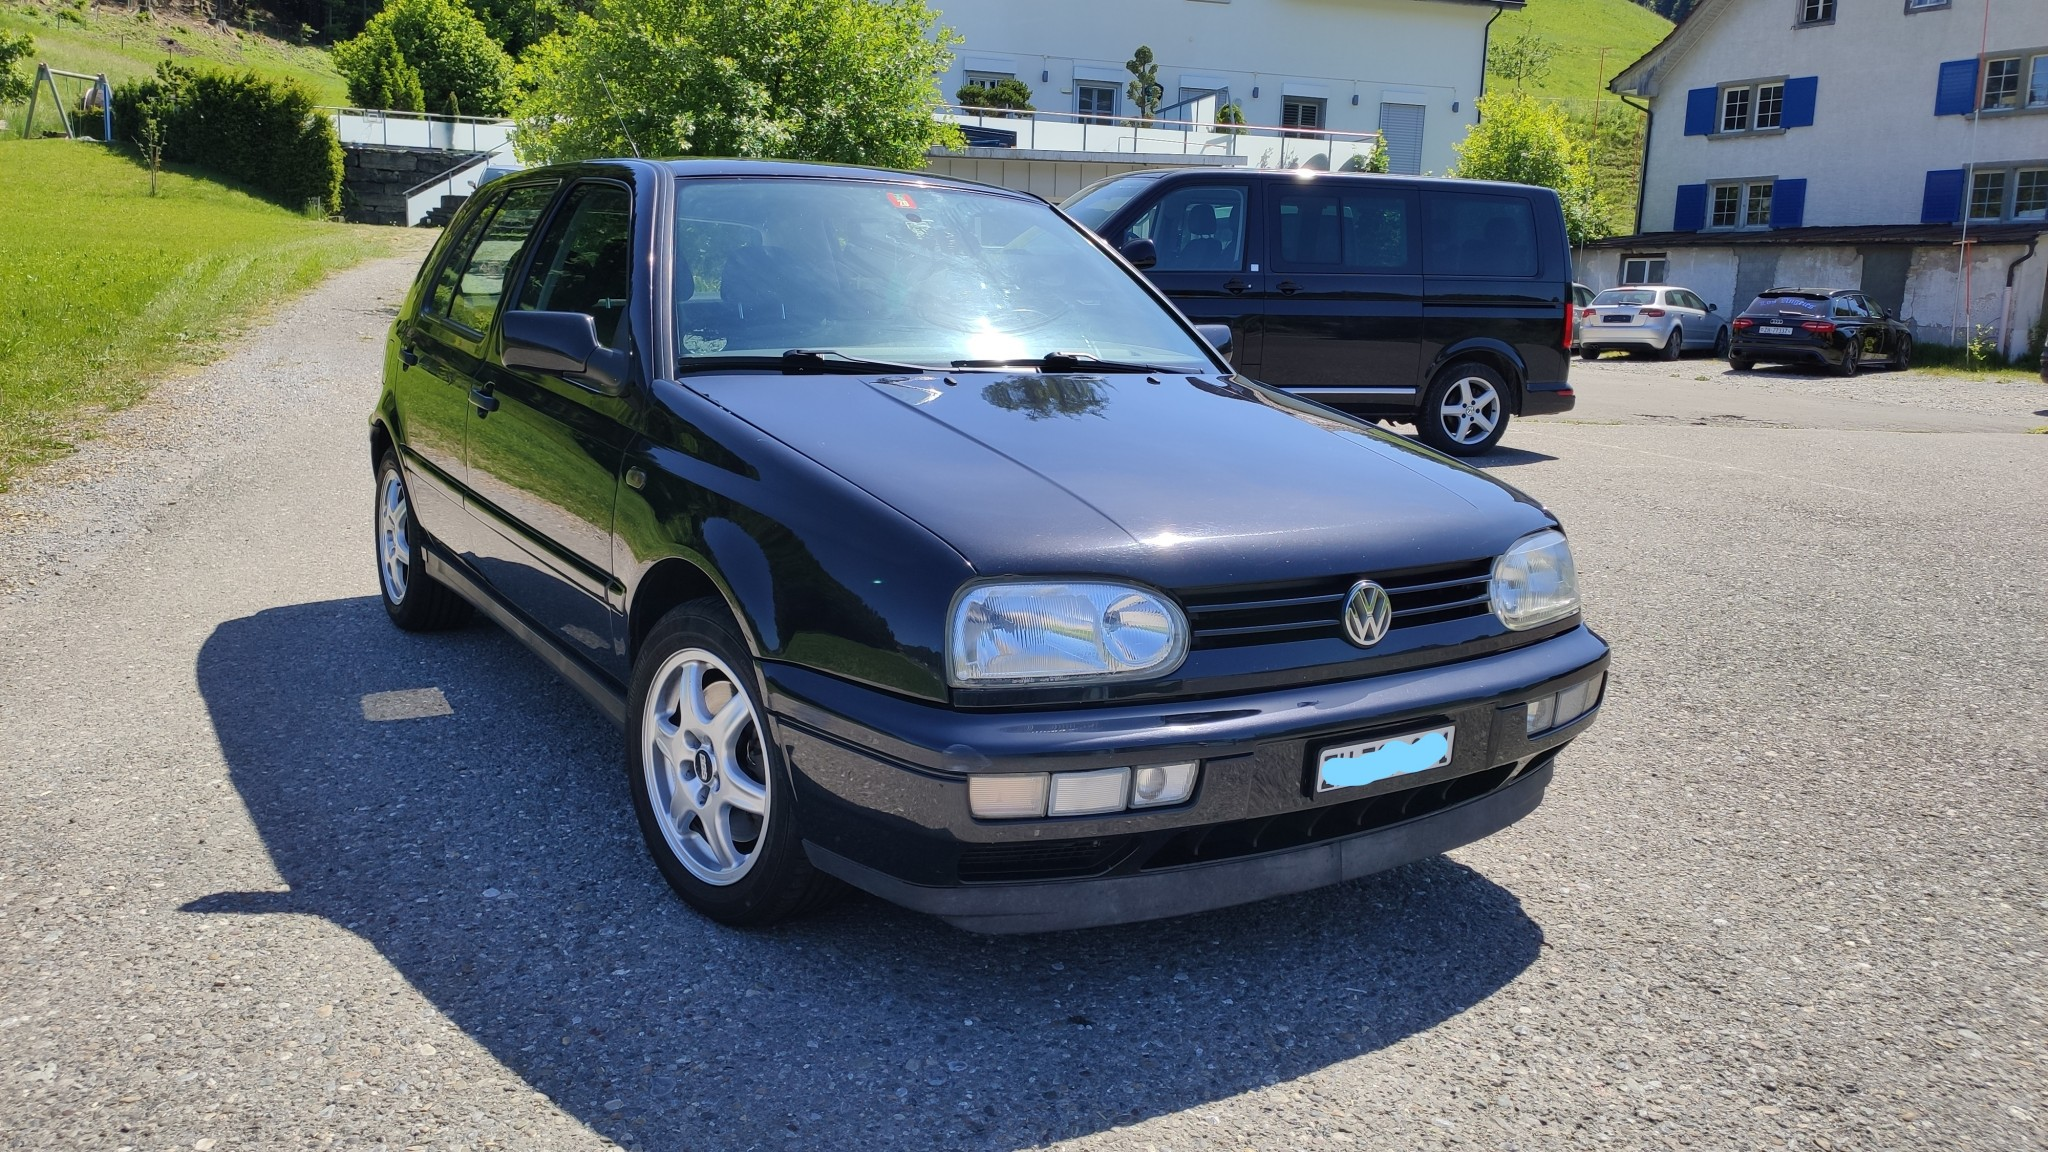 saloon VW Golf 3 2.9l VR6 Syncro